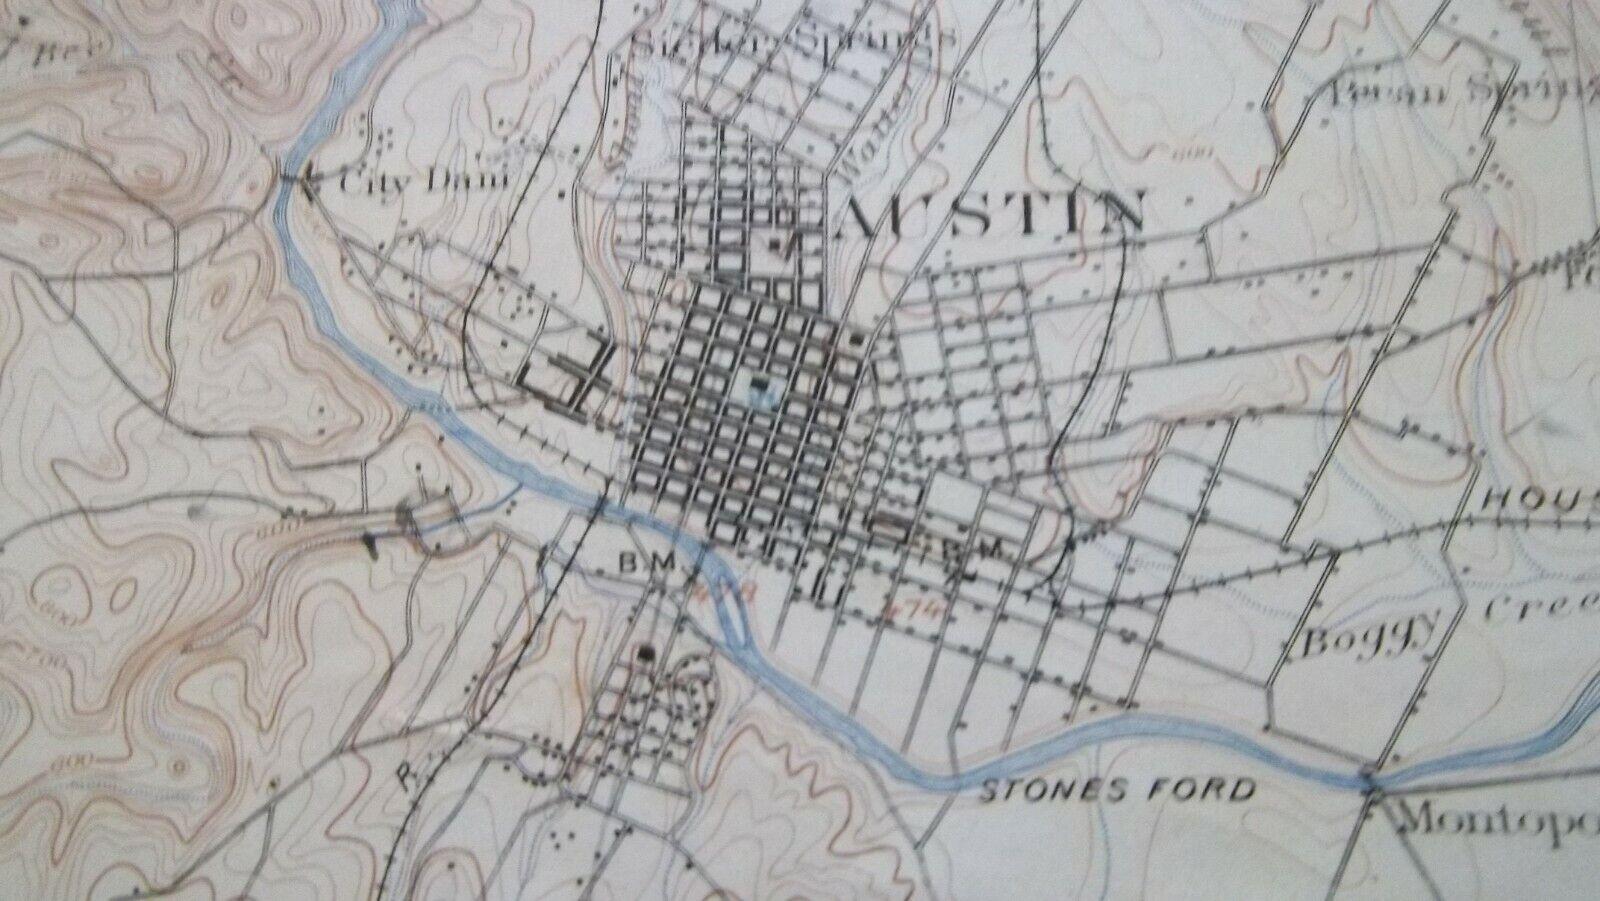 1901 Topo Map AUSTIN TEXAS Surveyed in 189596  Railroads  Buildings  Antique